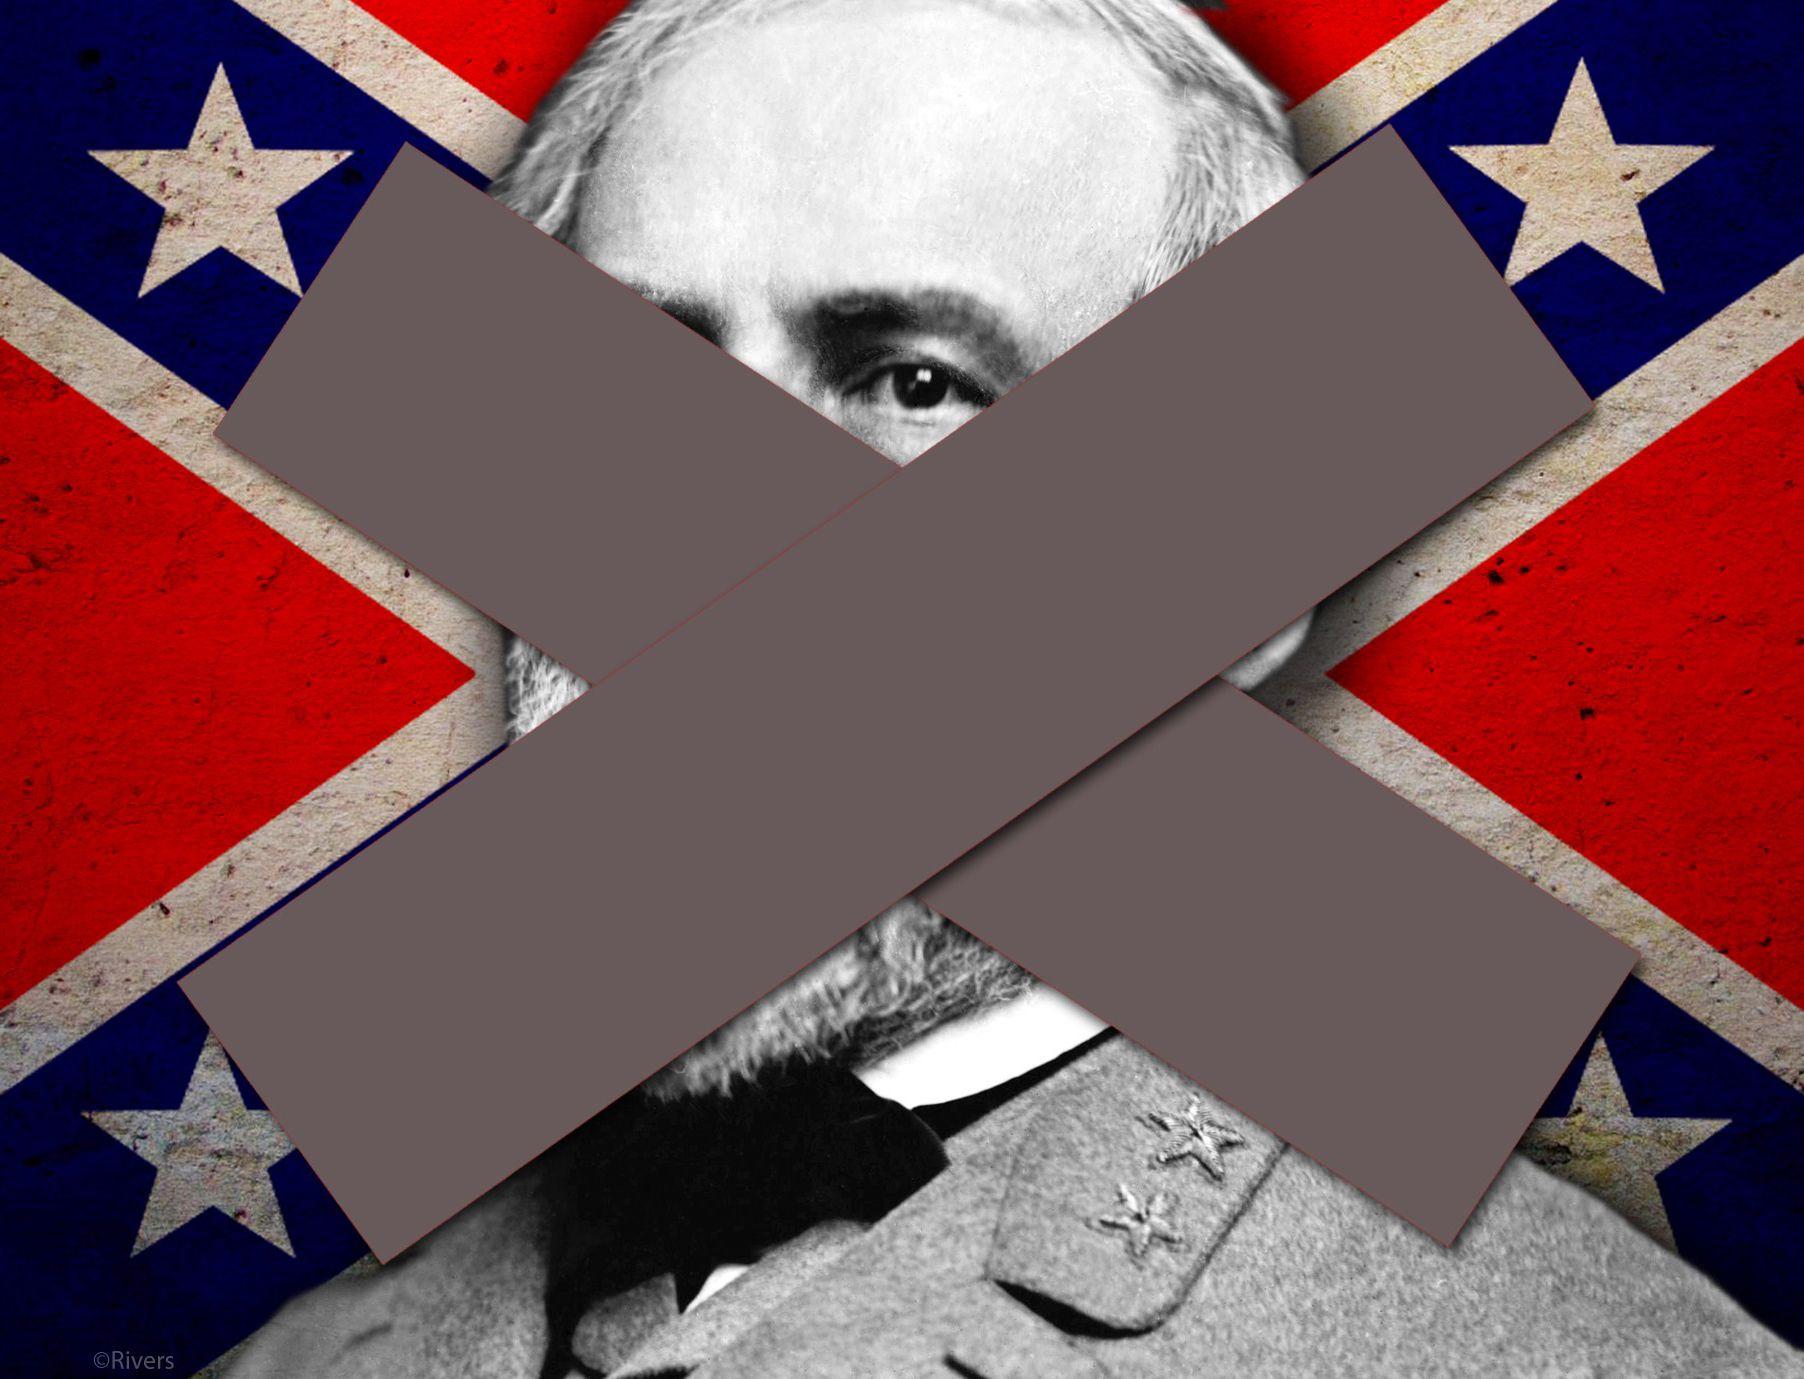 Confederates Weren't Patriots— They Were Traitors